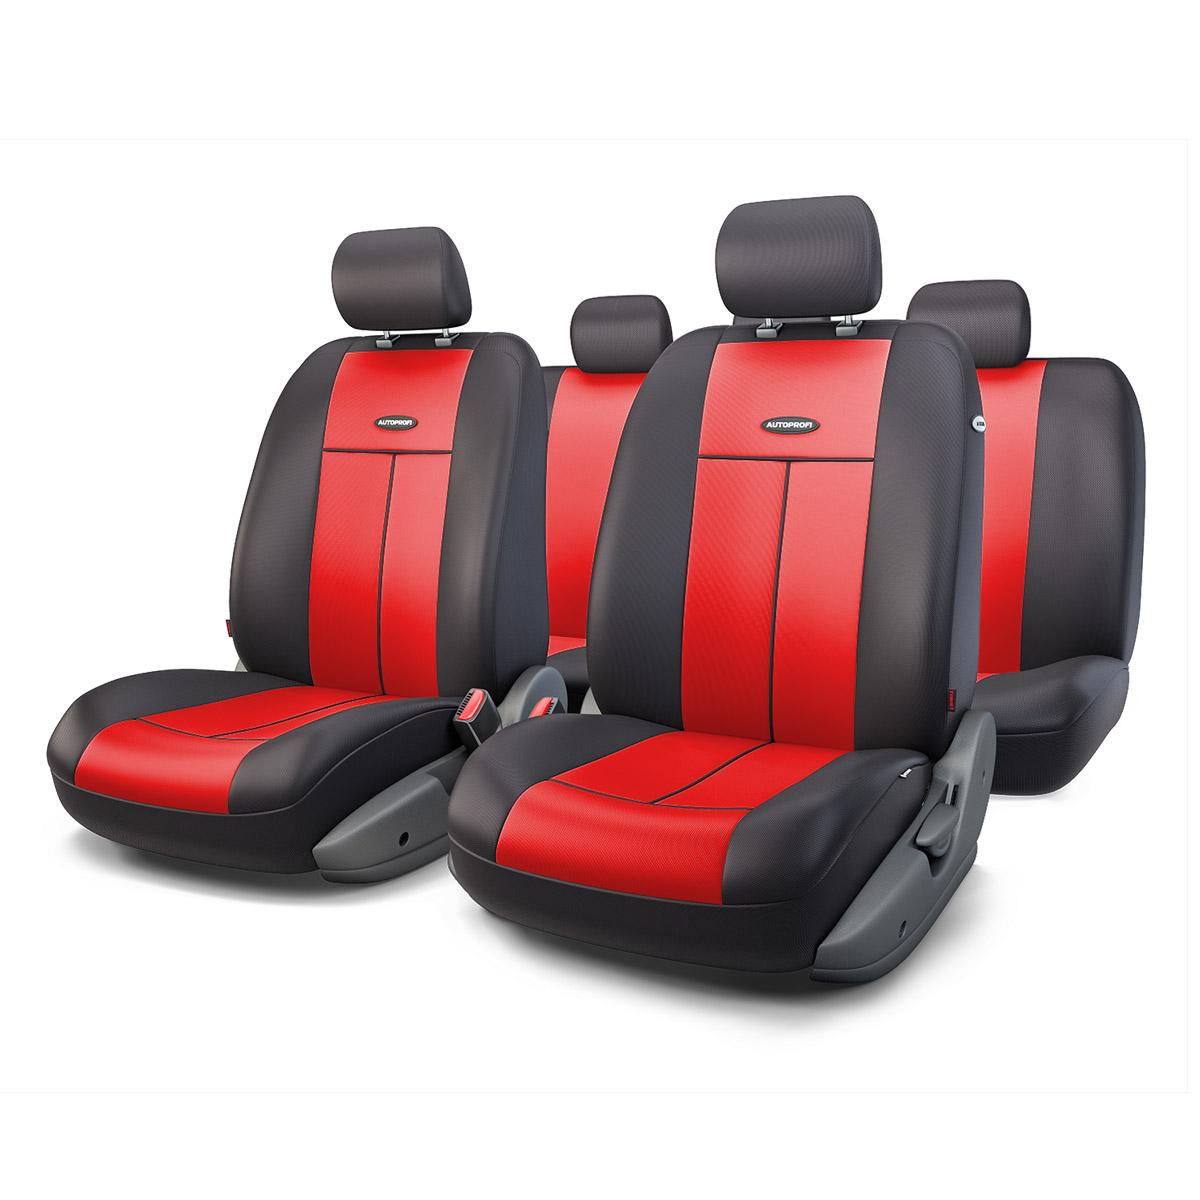 Чехол на сиденье Autoprofi Tt-902p bk/rd чехол на сиденье autoprofi r 902p bl